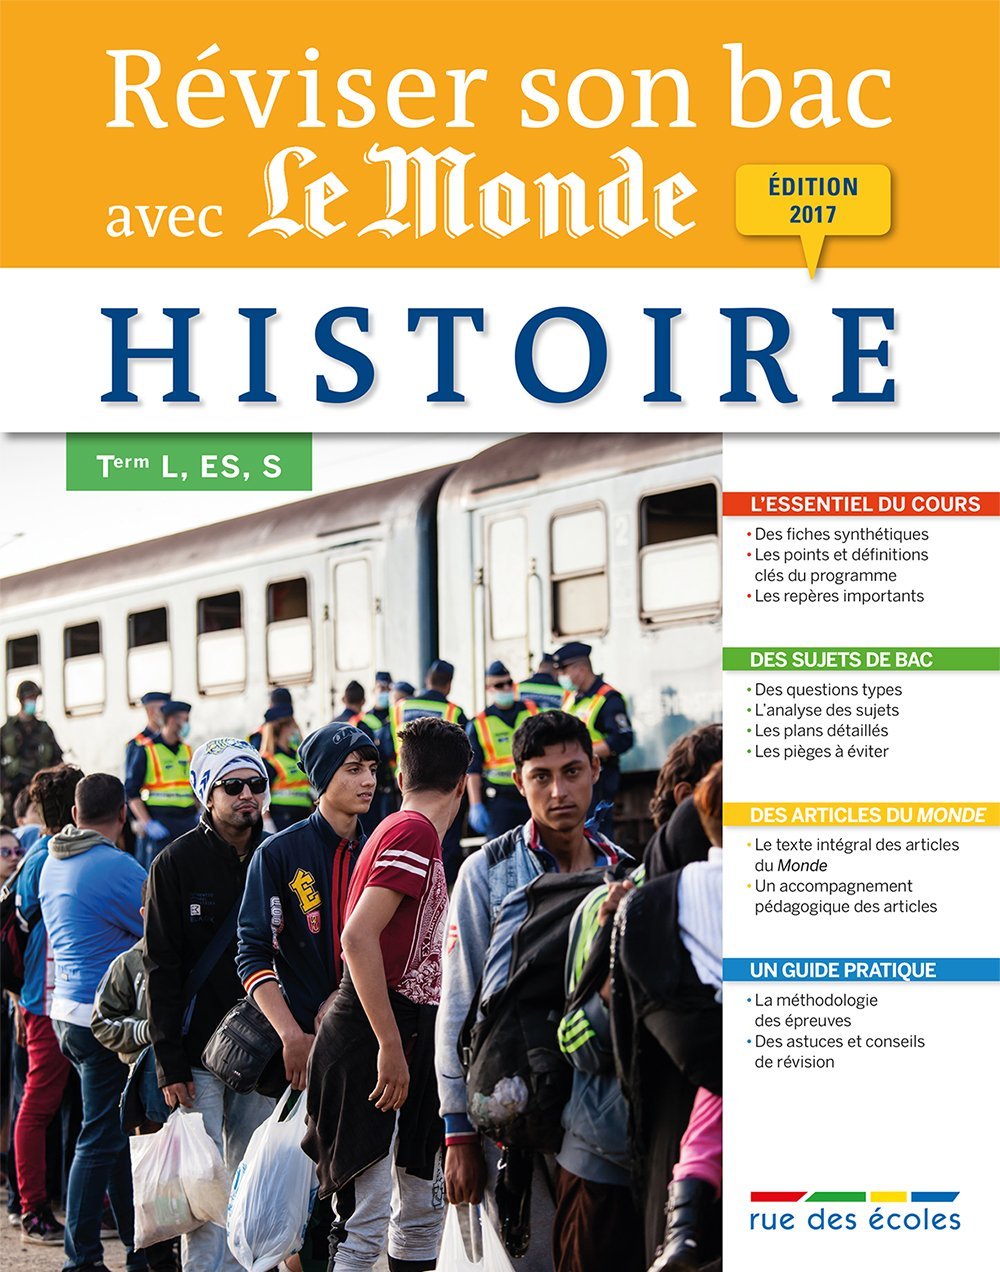 Reviser Son Bac avec Le Monde : Histoire, Édition 2017 (French Edition) (French) Paperback – January 10, 2017